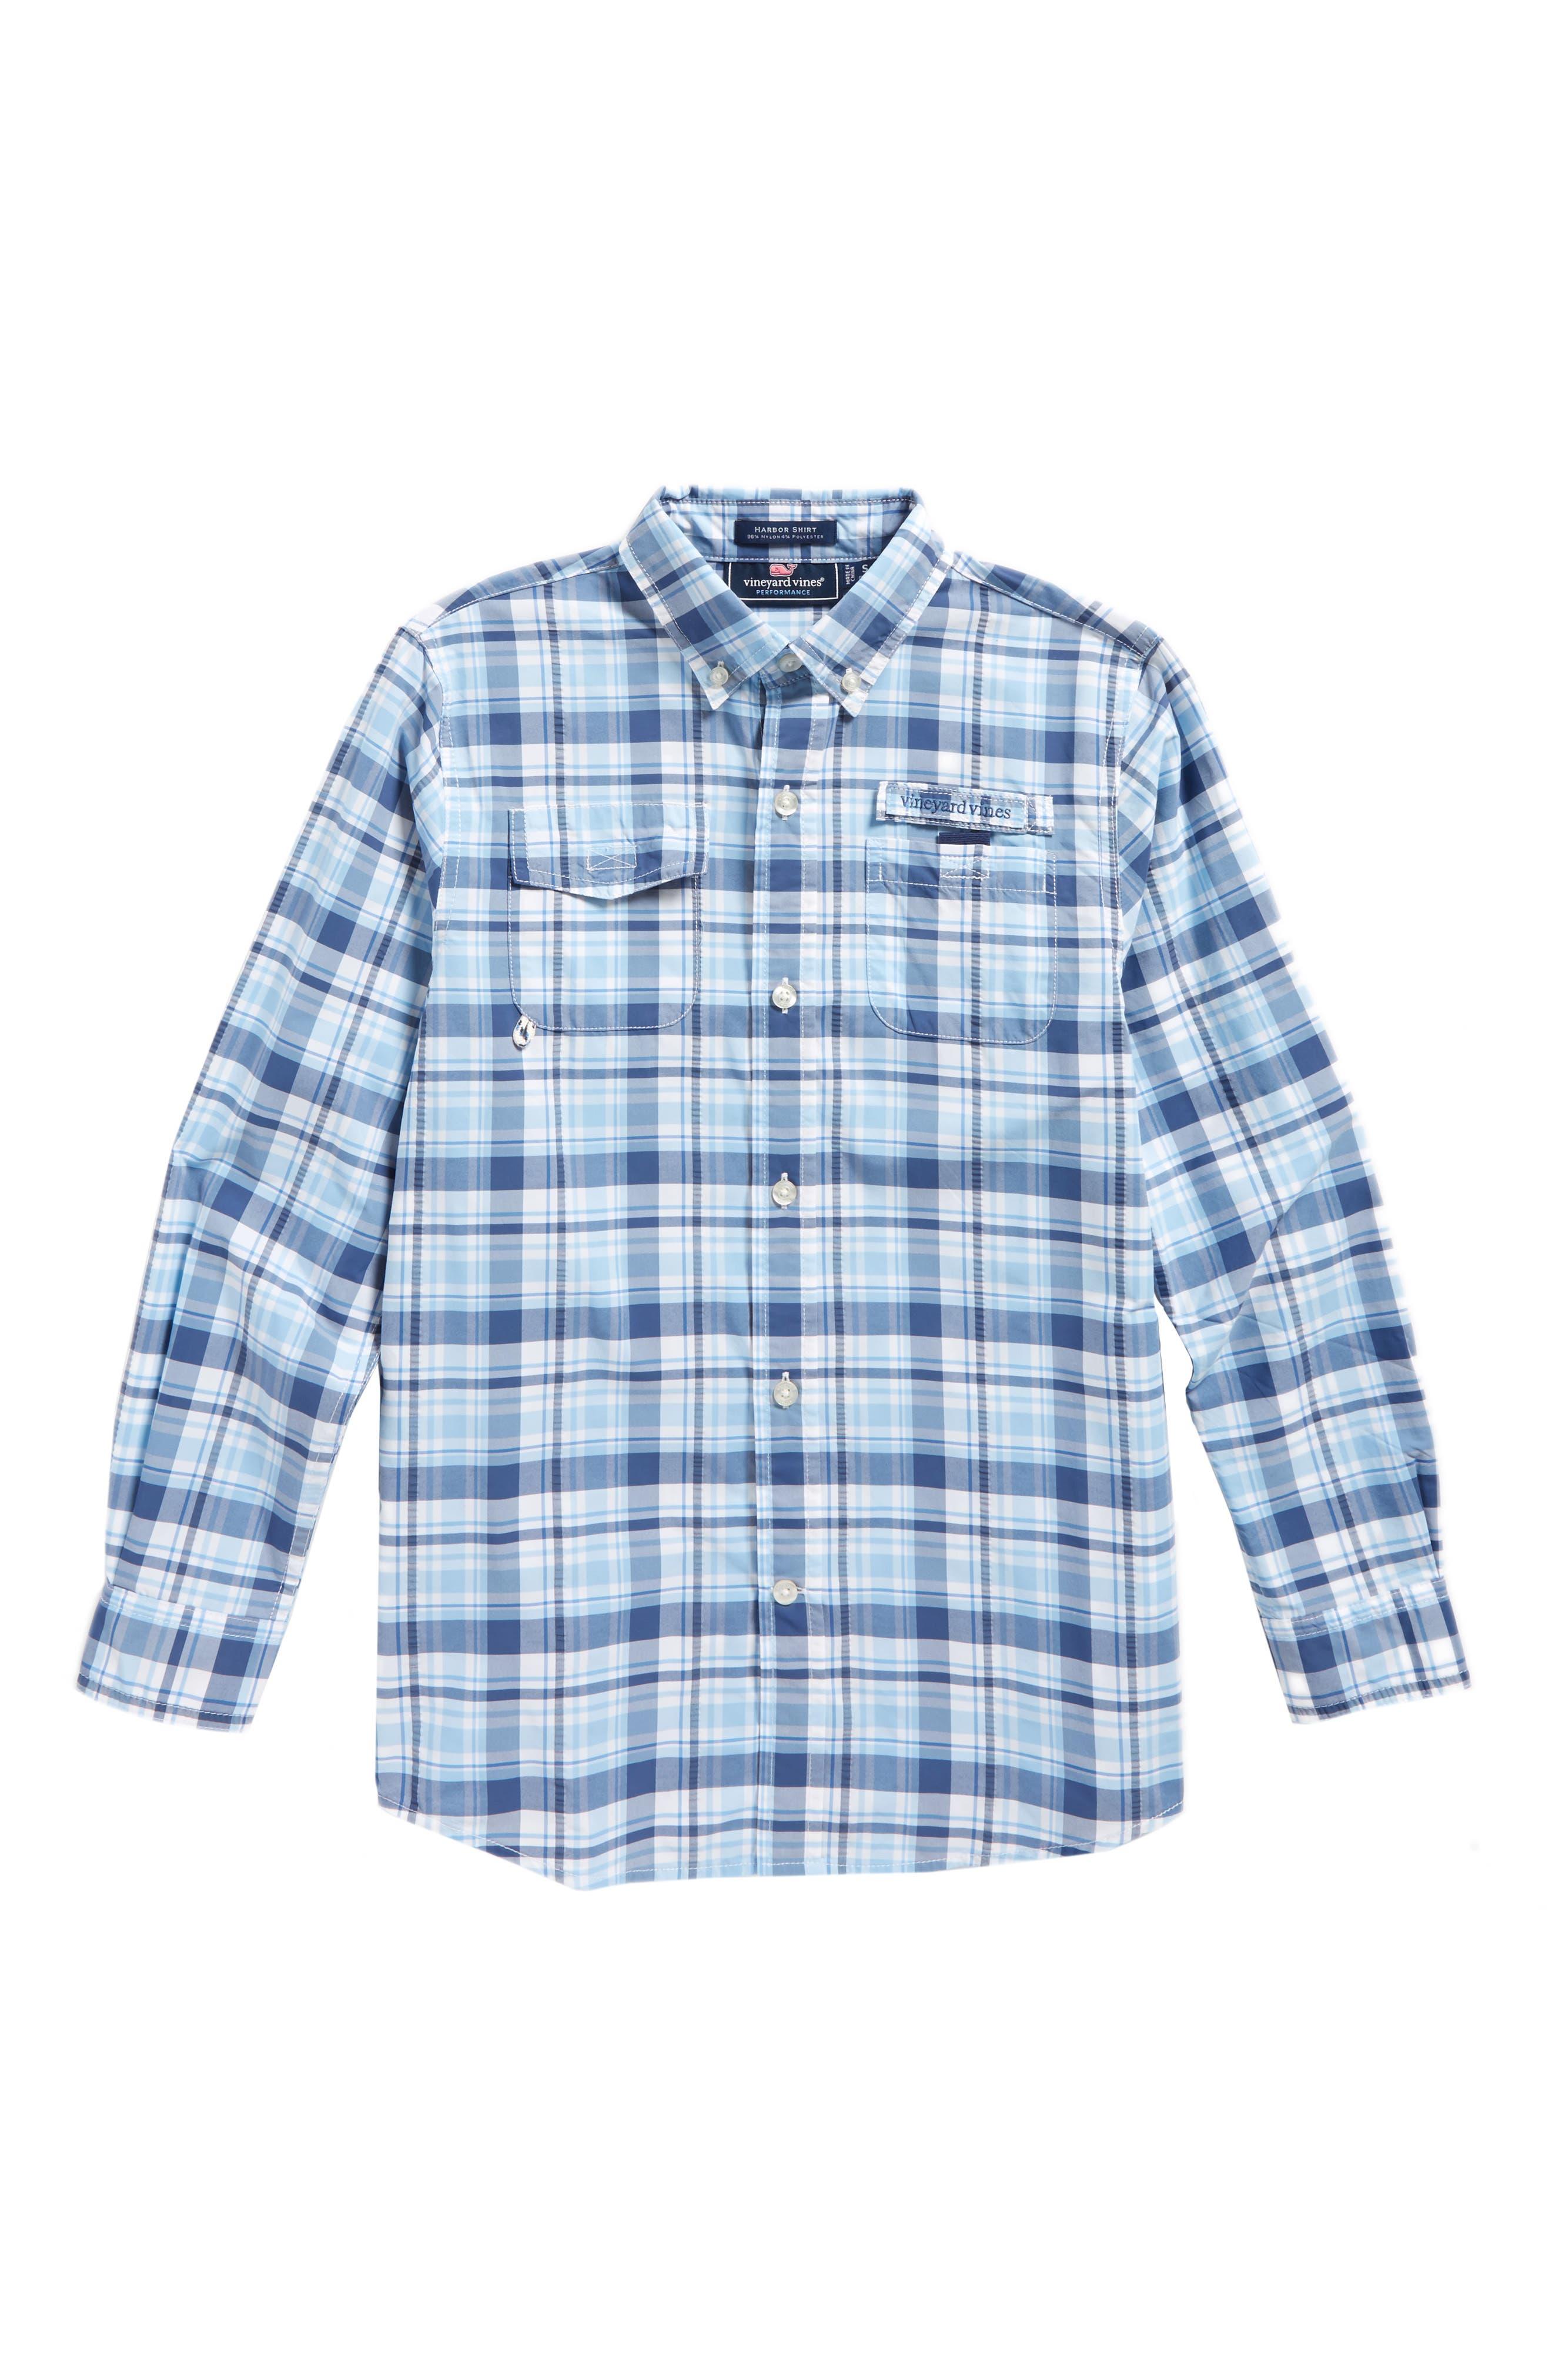 Harbor Plaid Shirt,                         Main,                         color,